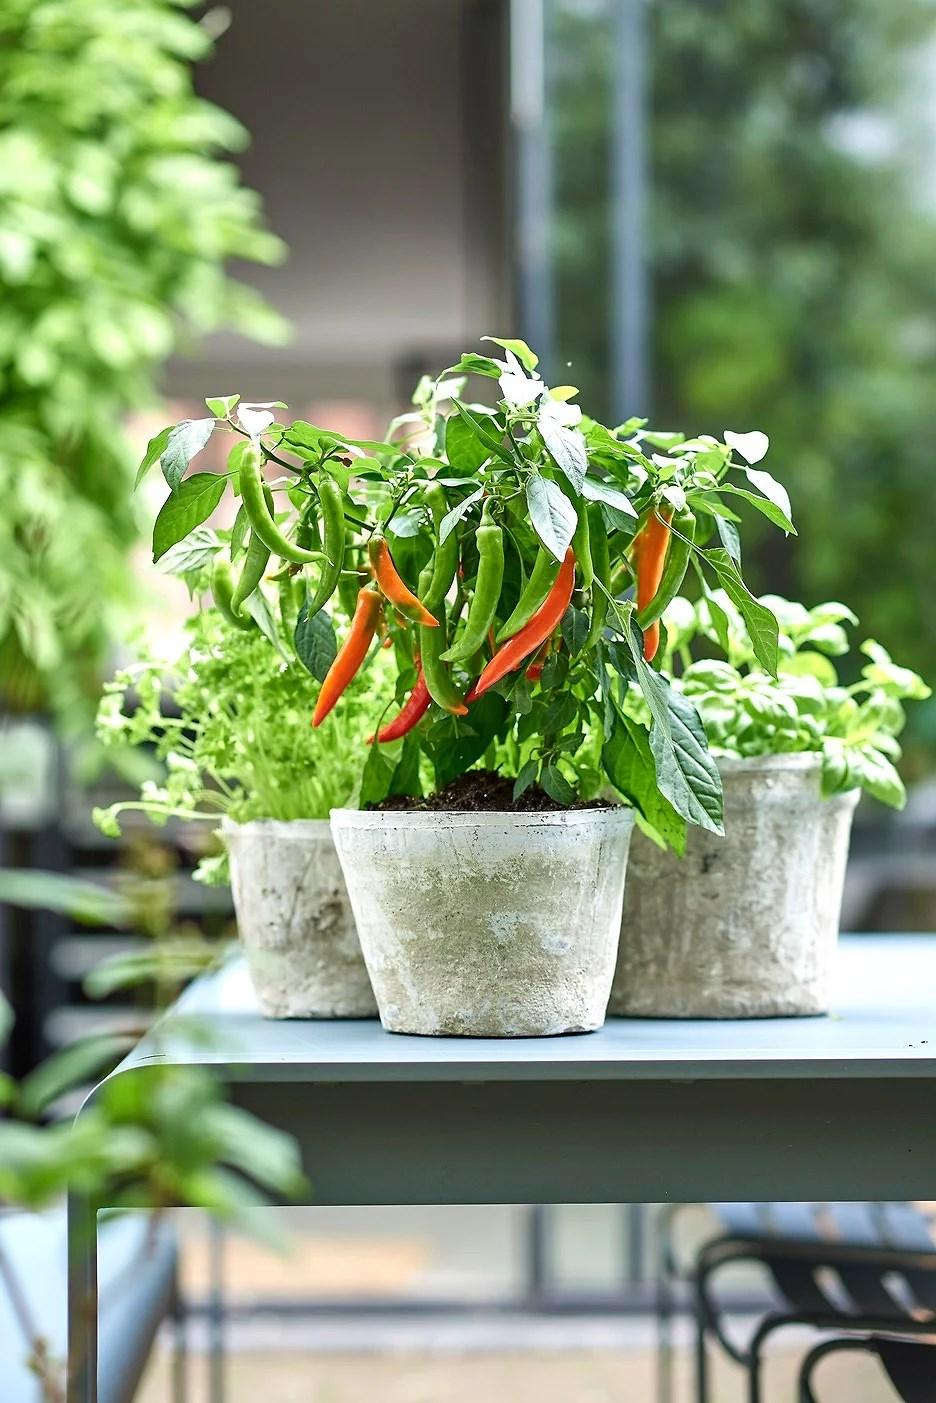 Groenteplantjes op je terras!